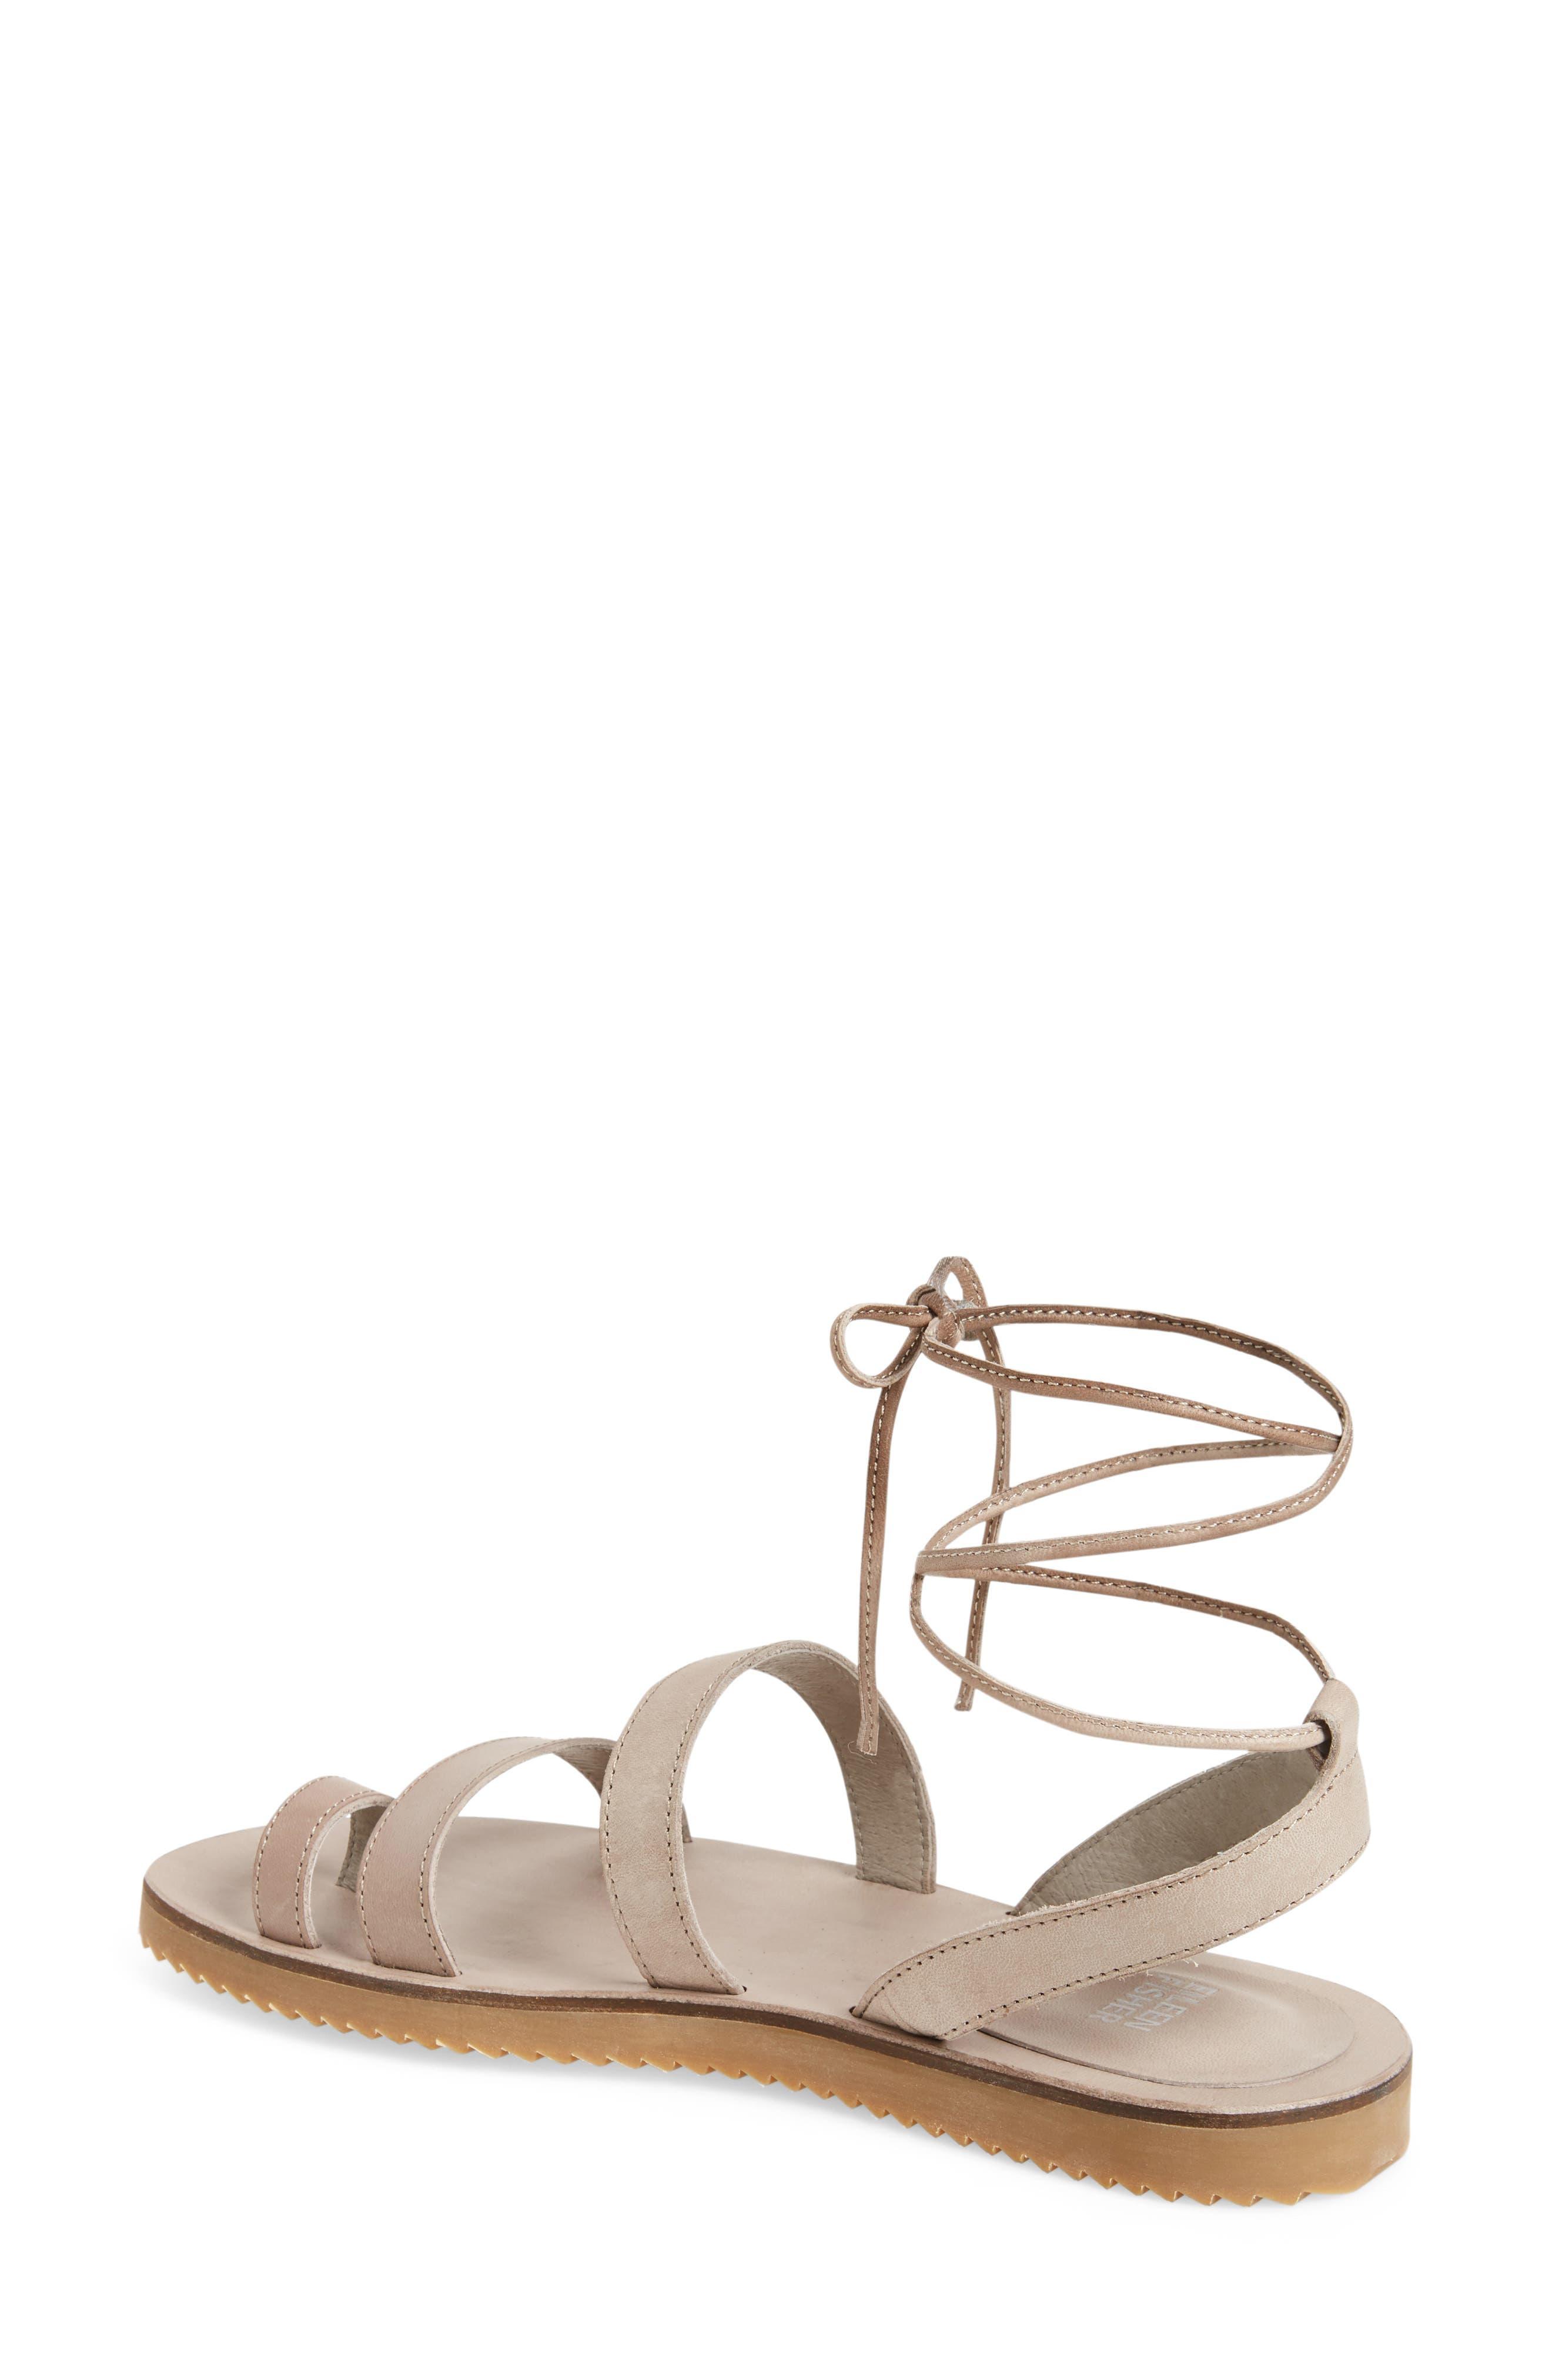 Alternate Image 2  - Eileen Fisher Wales Lace-Up Sandal (Women)